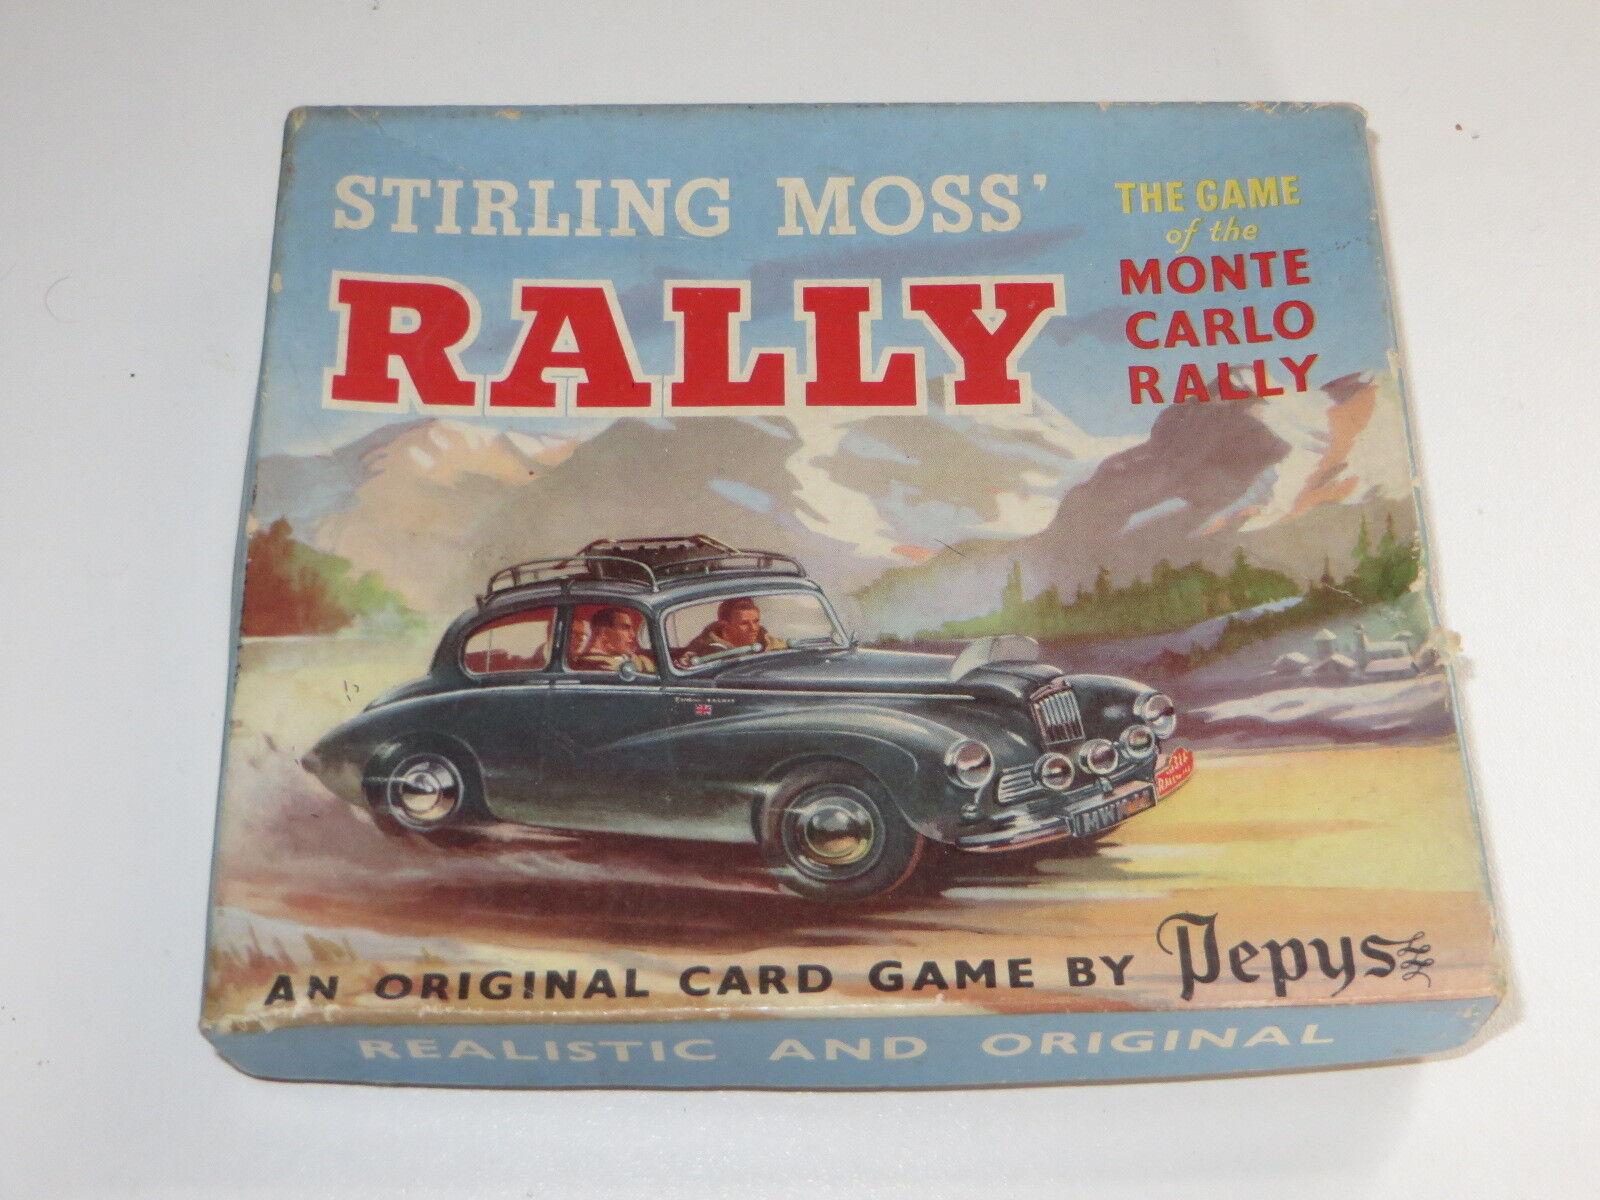 1954 Pepys Stirling Moss Monte Carlo Rally Card Game-Raro en Caja Completa